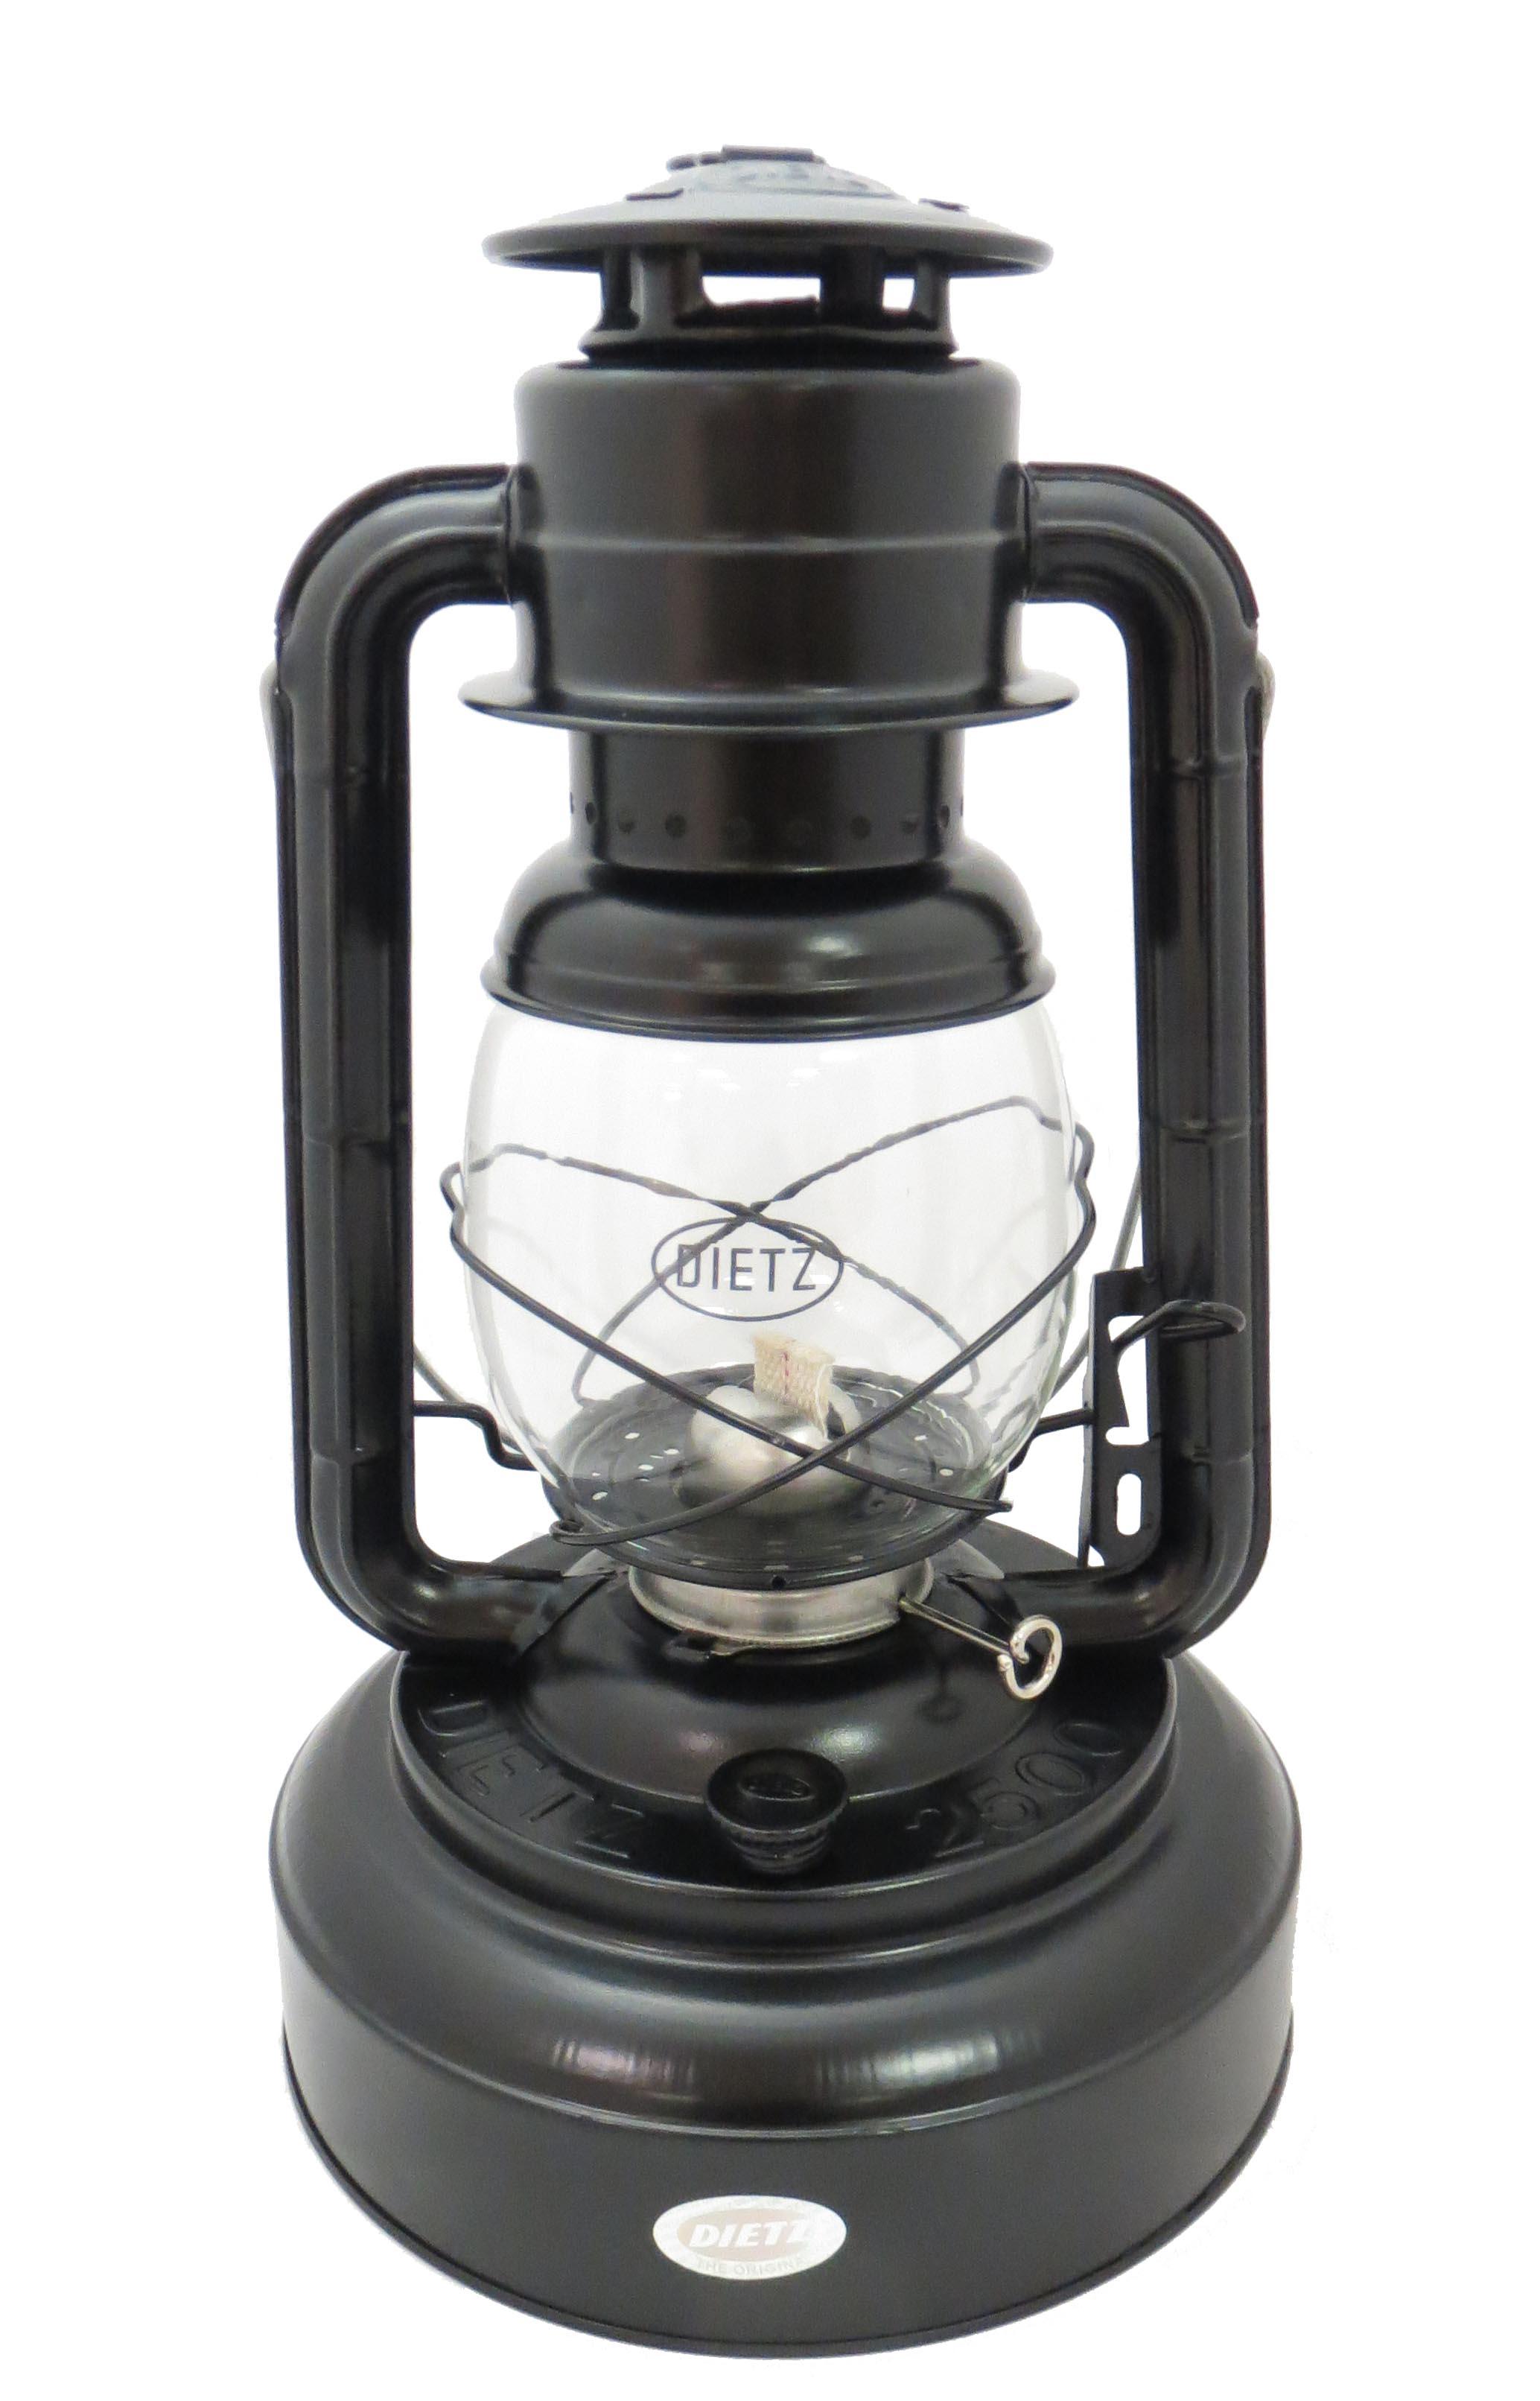 Dietz 2500 Jupiter Lantern Black 69881 B Amp P Lamp Supply